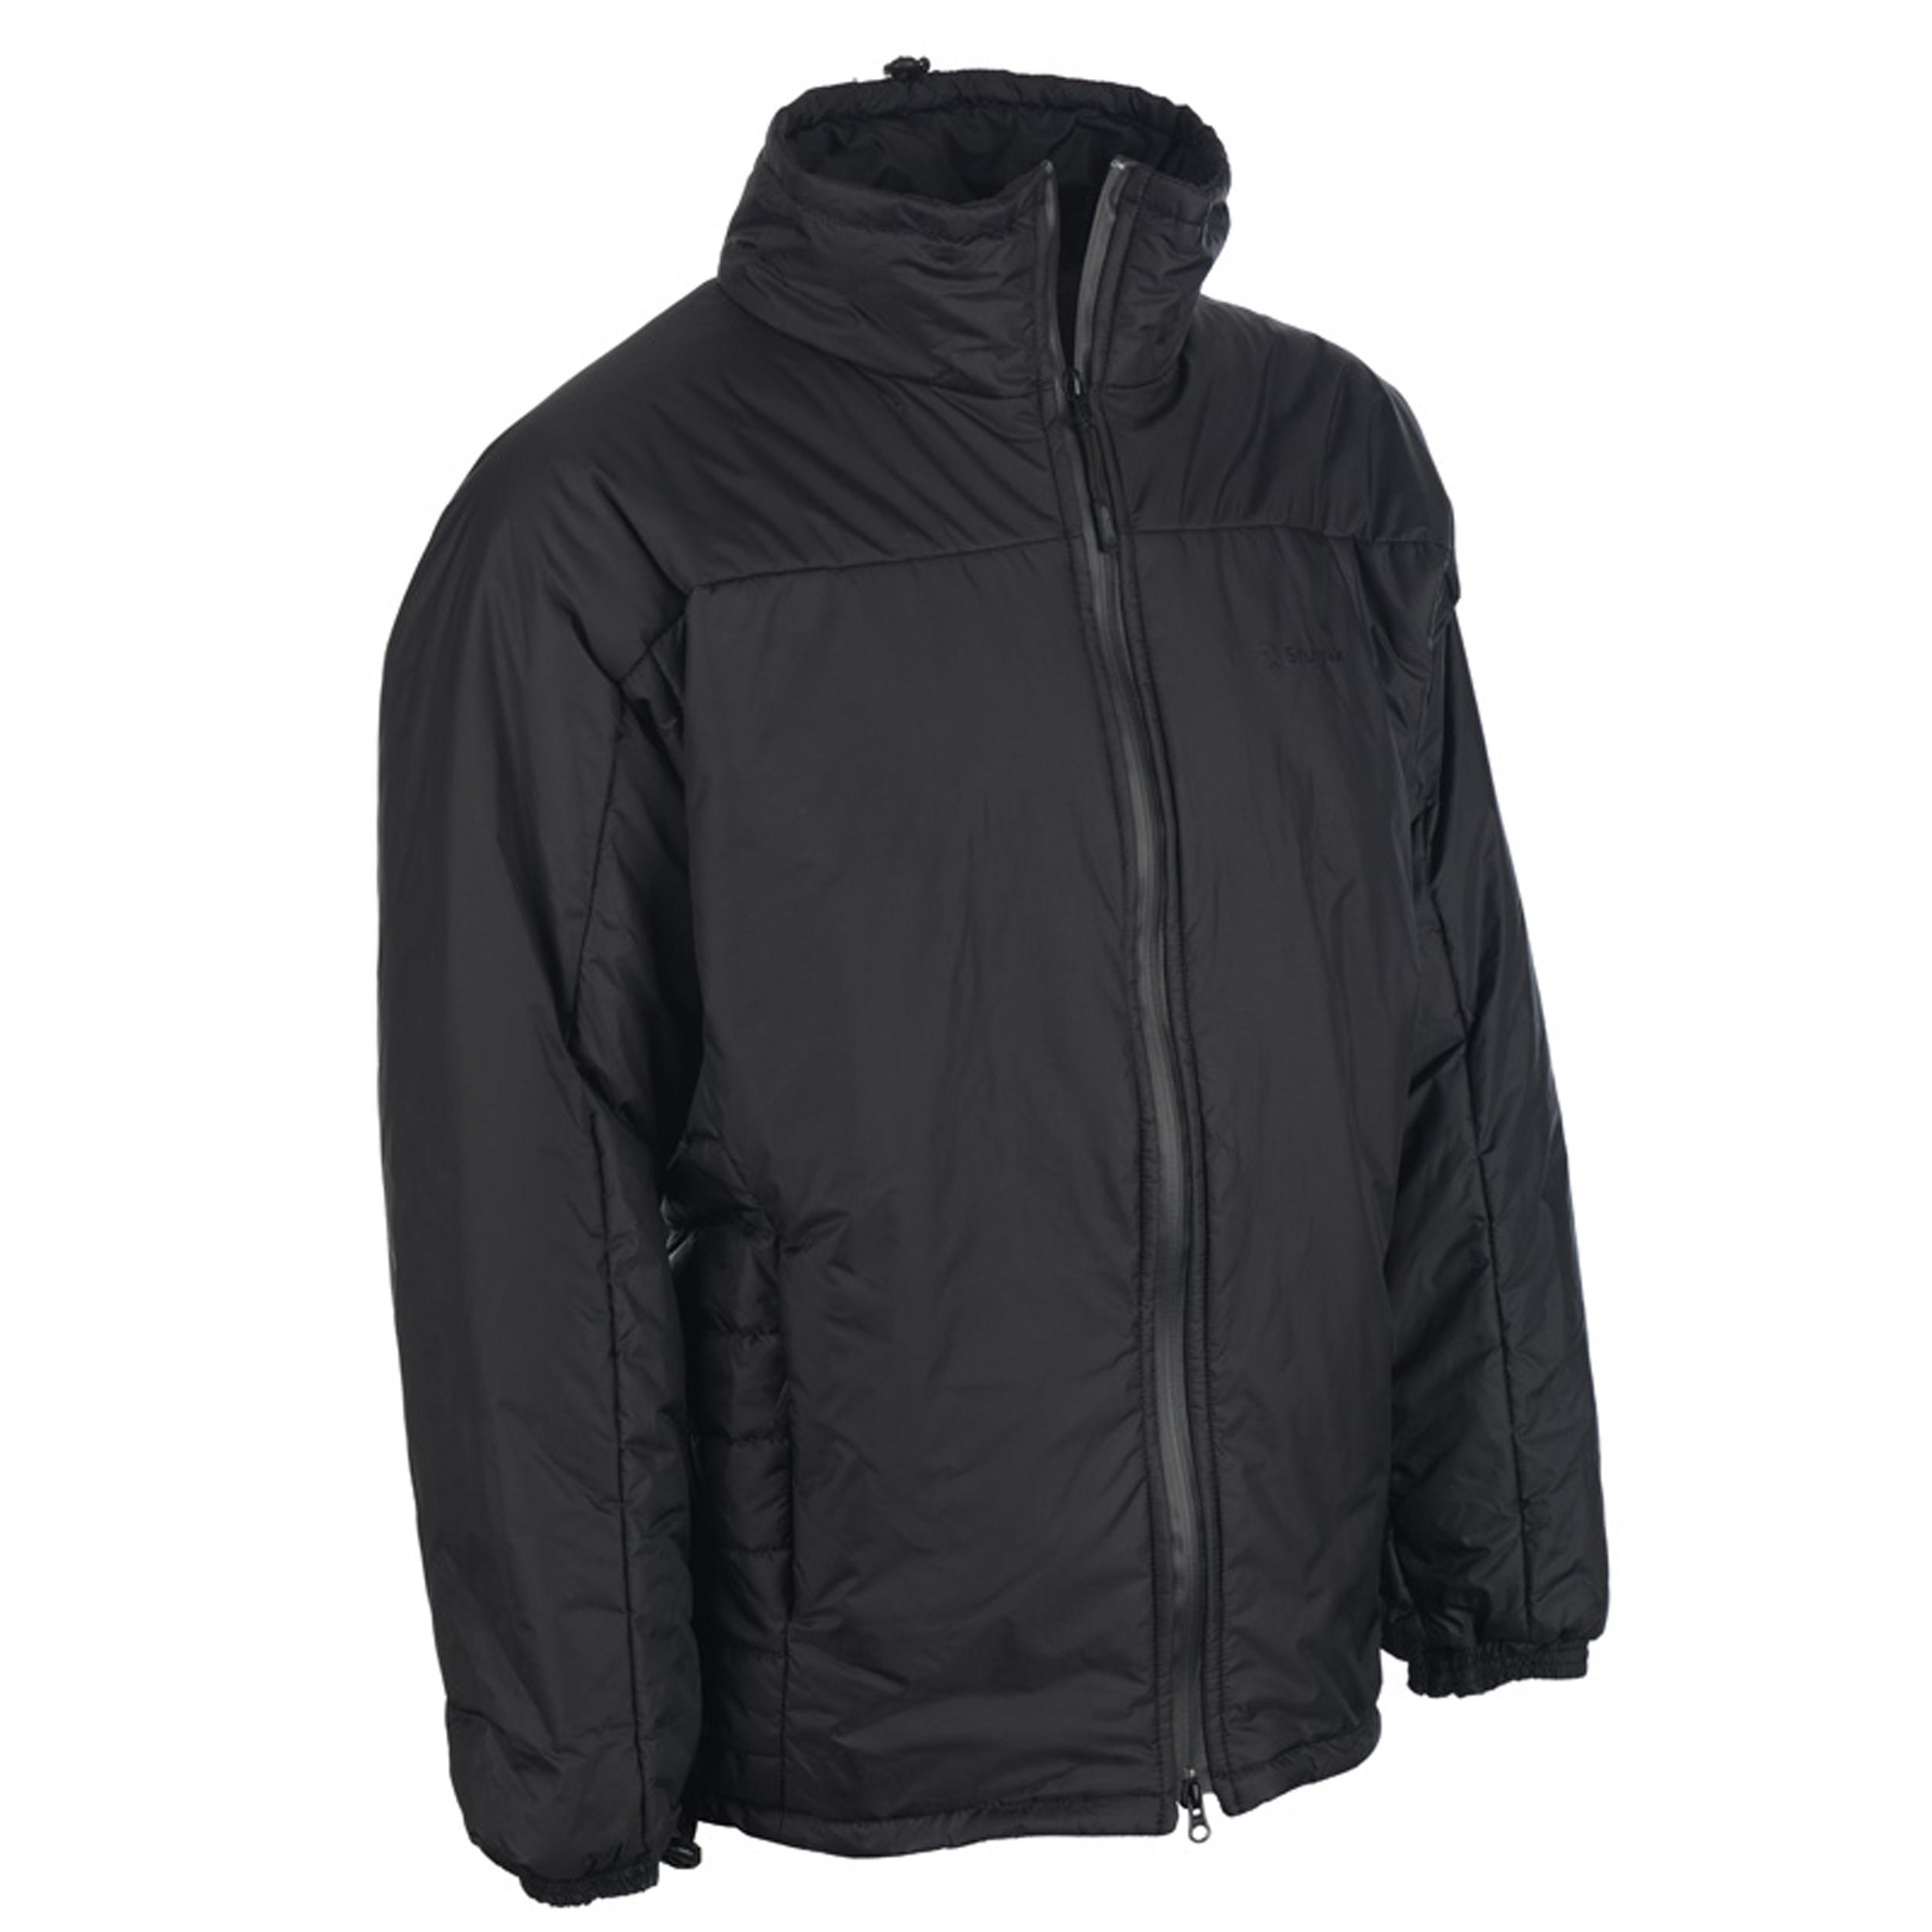 Snugpak Sj3 Jacket Black MD